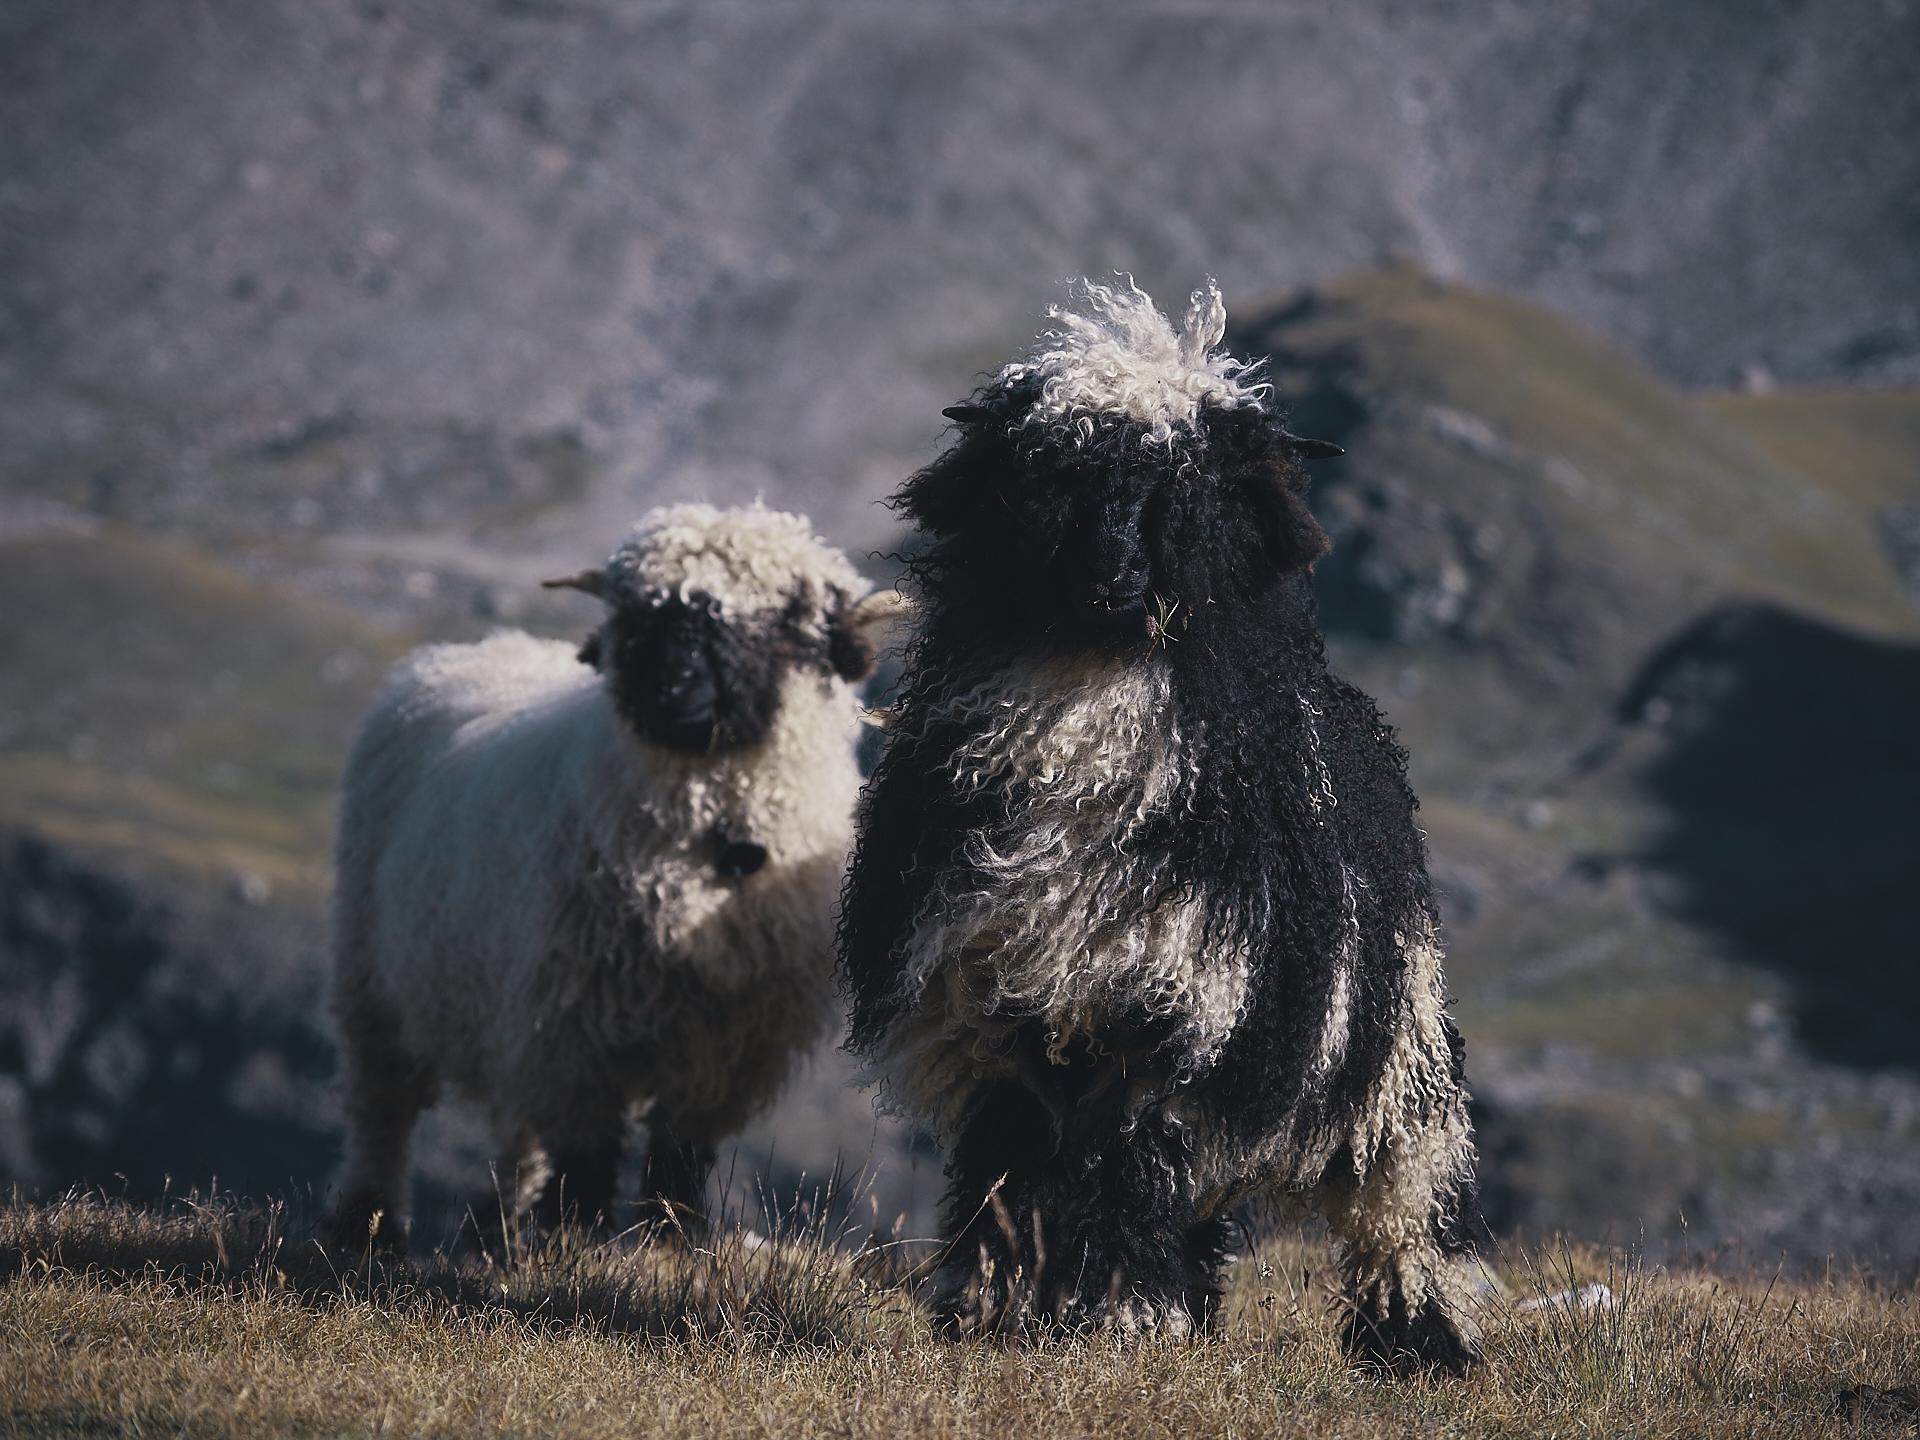 Black Nose sheep of the Valais, Switzerland